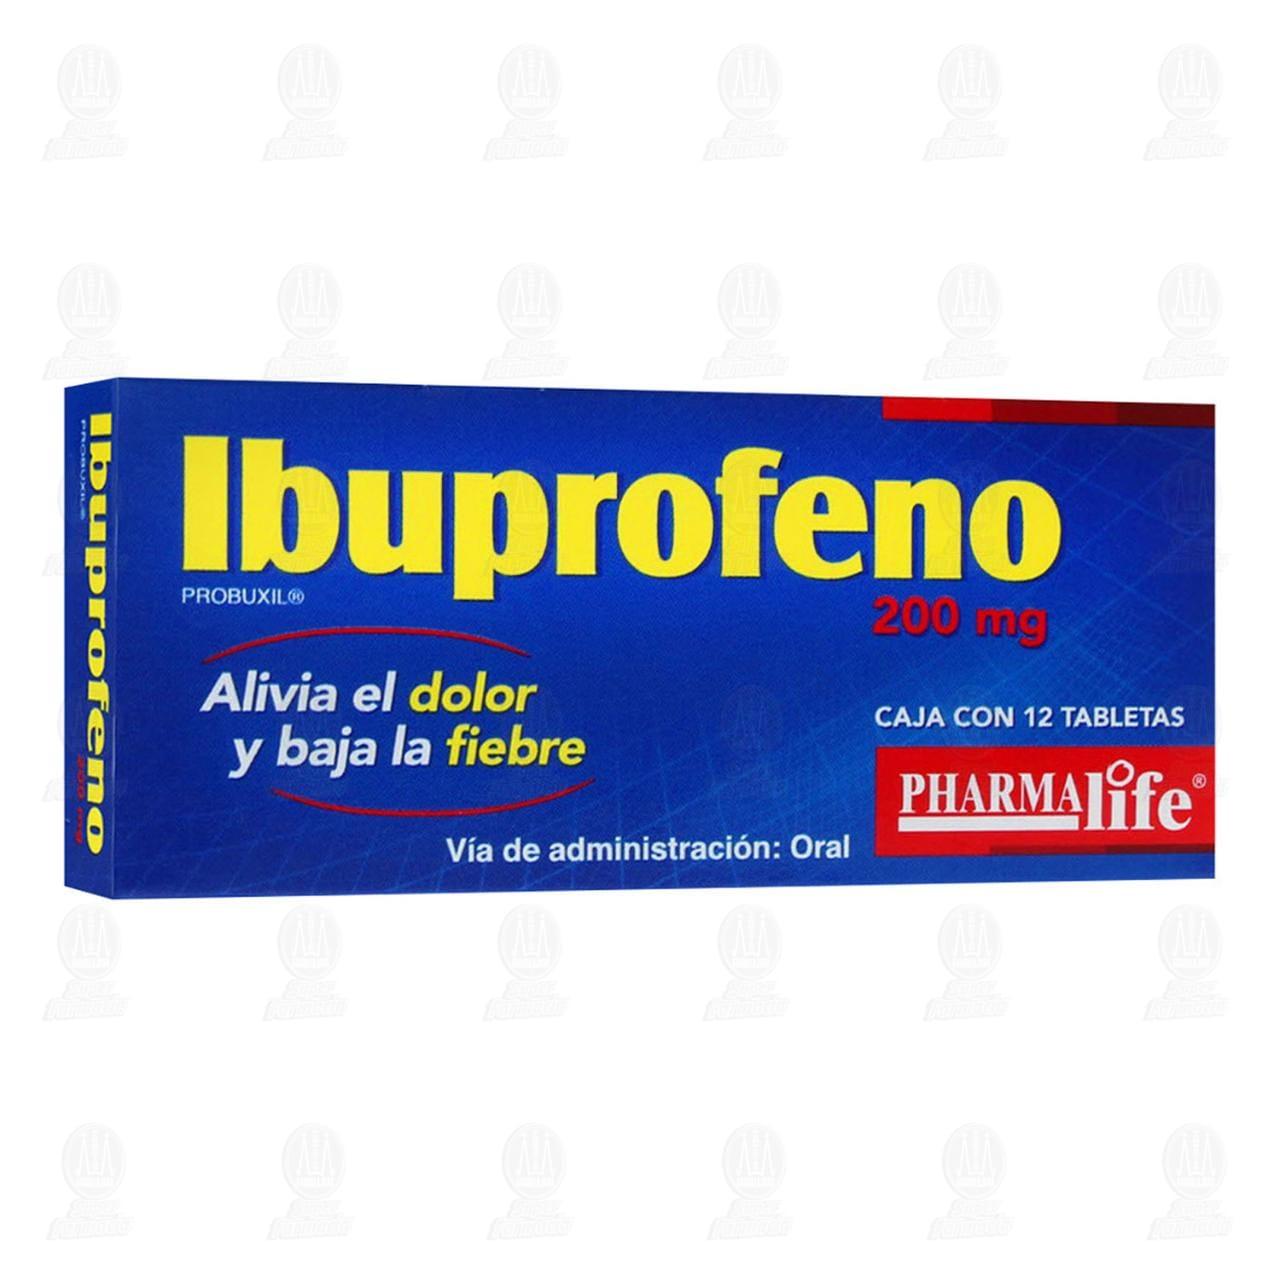 Comprar Ibuprofeno 200mg 12 Tabletas Pharmalife en Farmacias Guadalajara